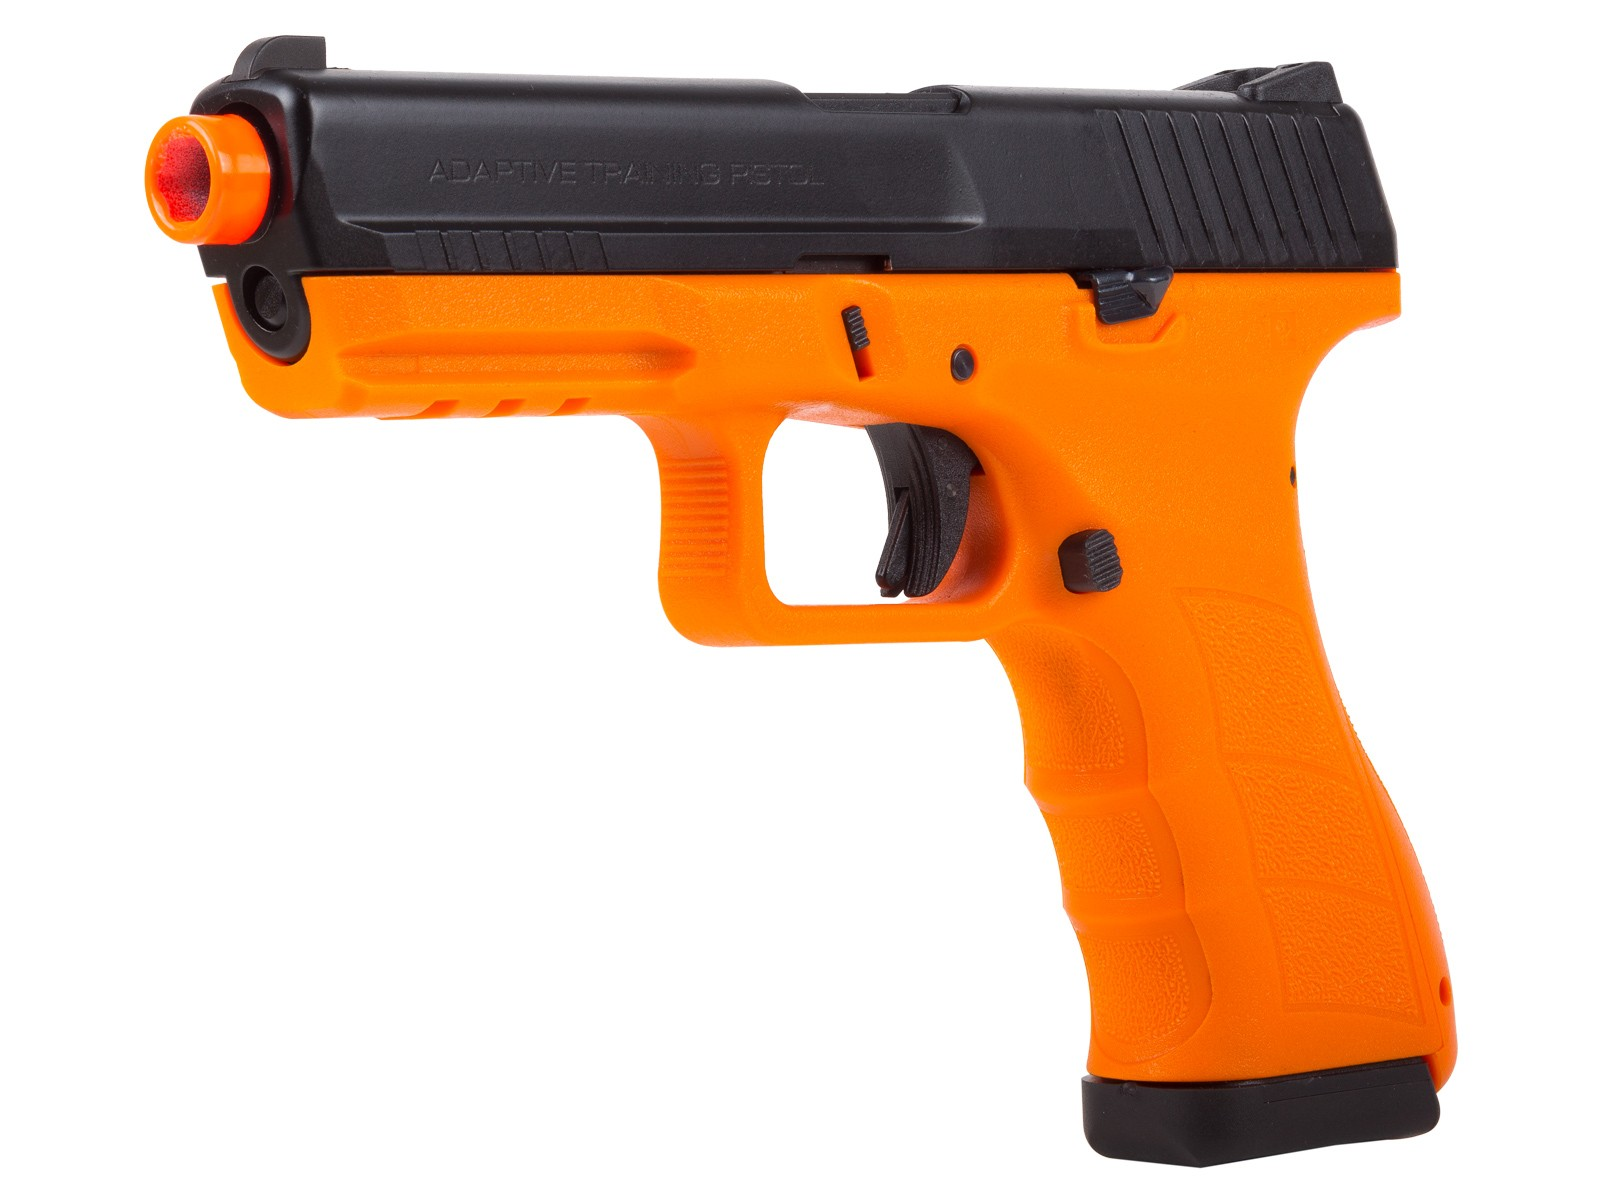 KWA_ATPLE2_Adaptive_Training_Airsoft_Pistol_6mm